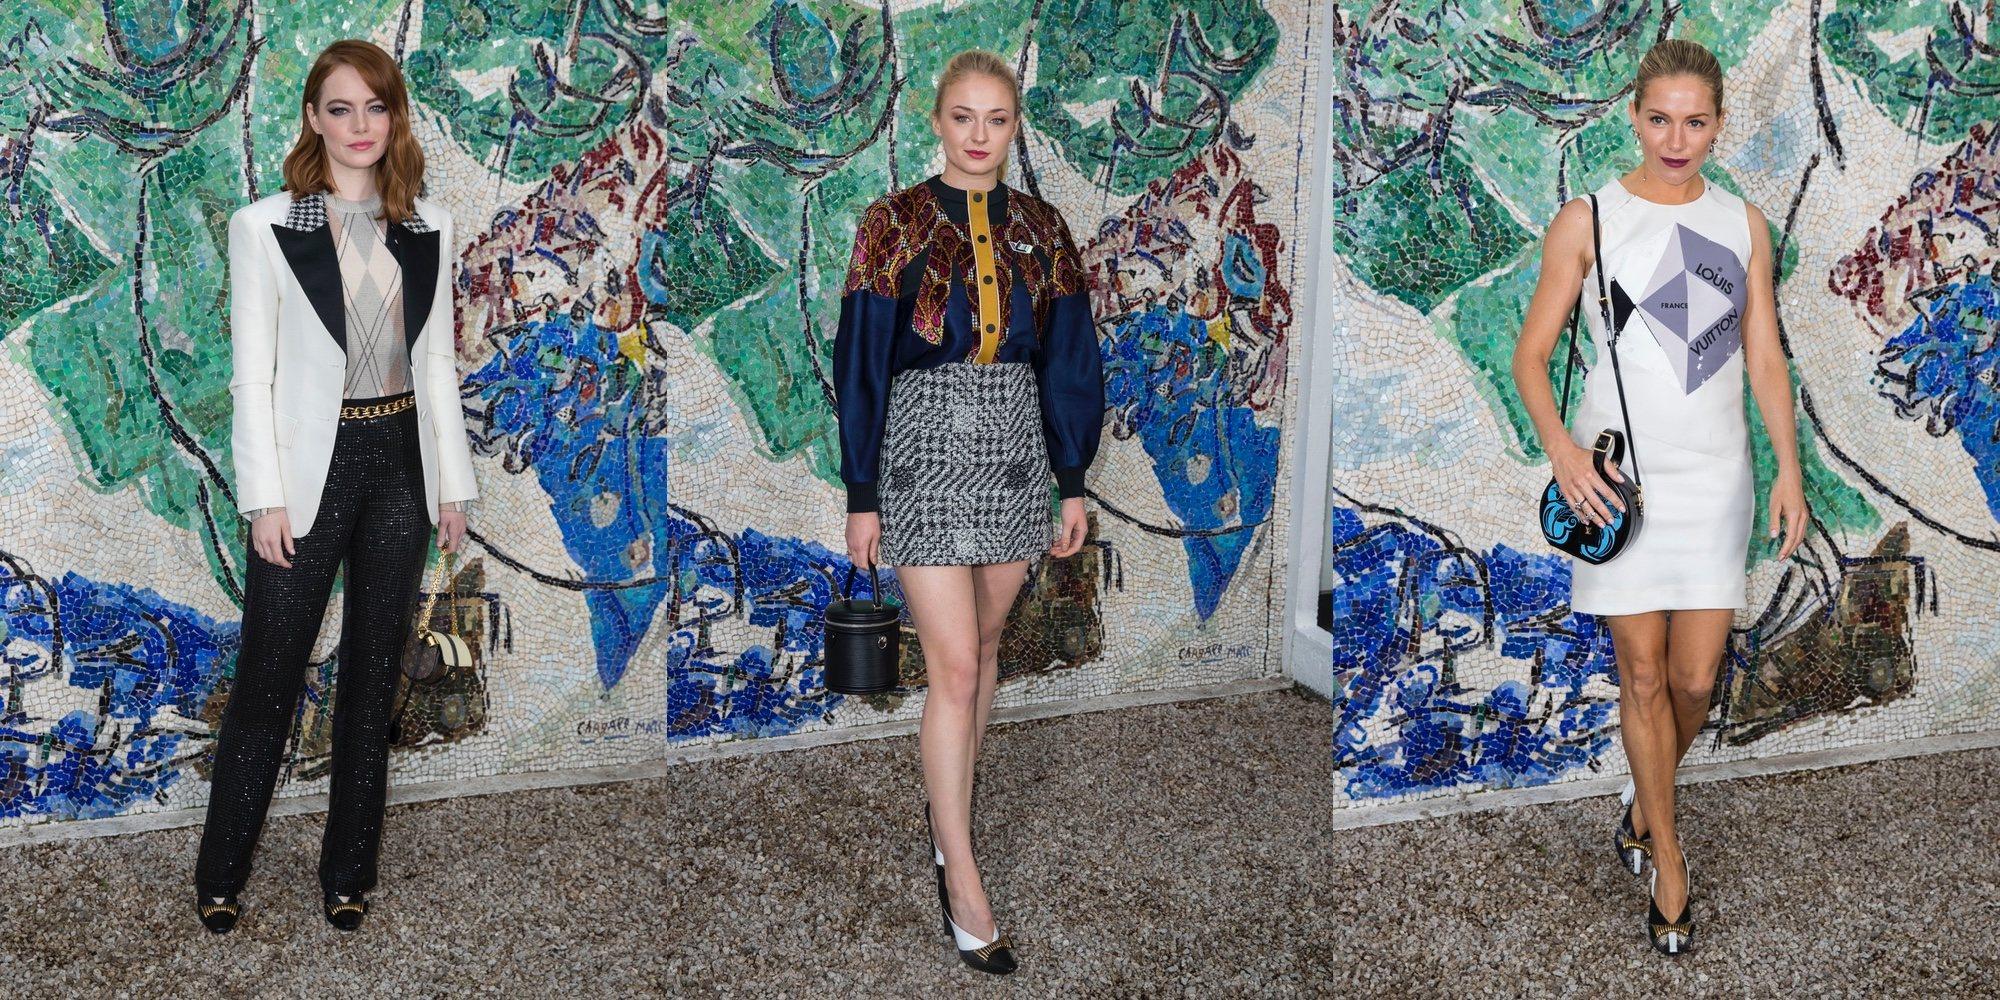 Emma Stone, Sophie Turner o Sienna Miller: los famosos no se pierden el desfile Louis Vuitton Cruise 2019